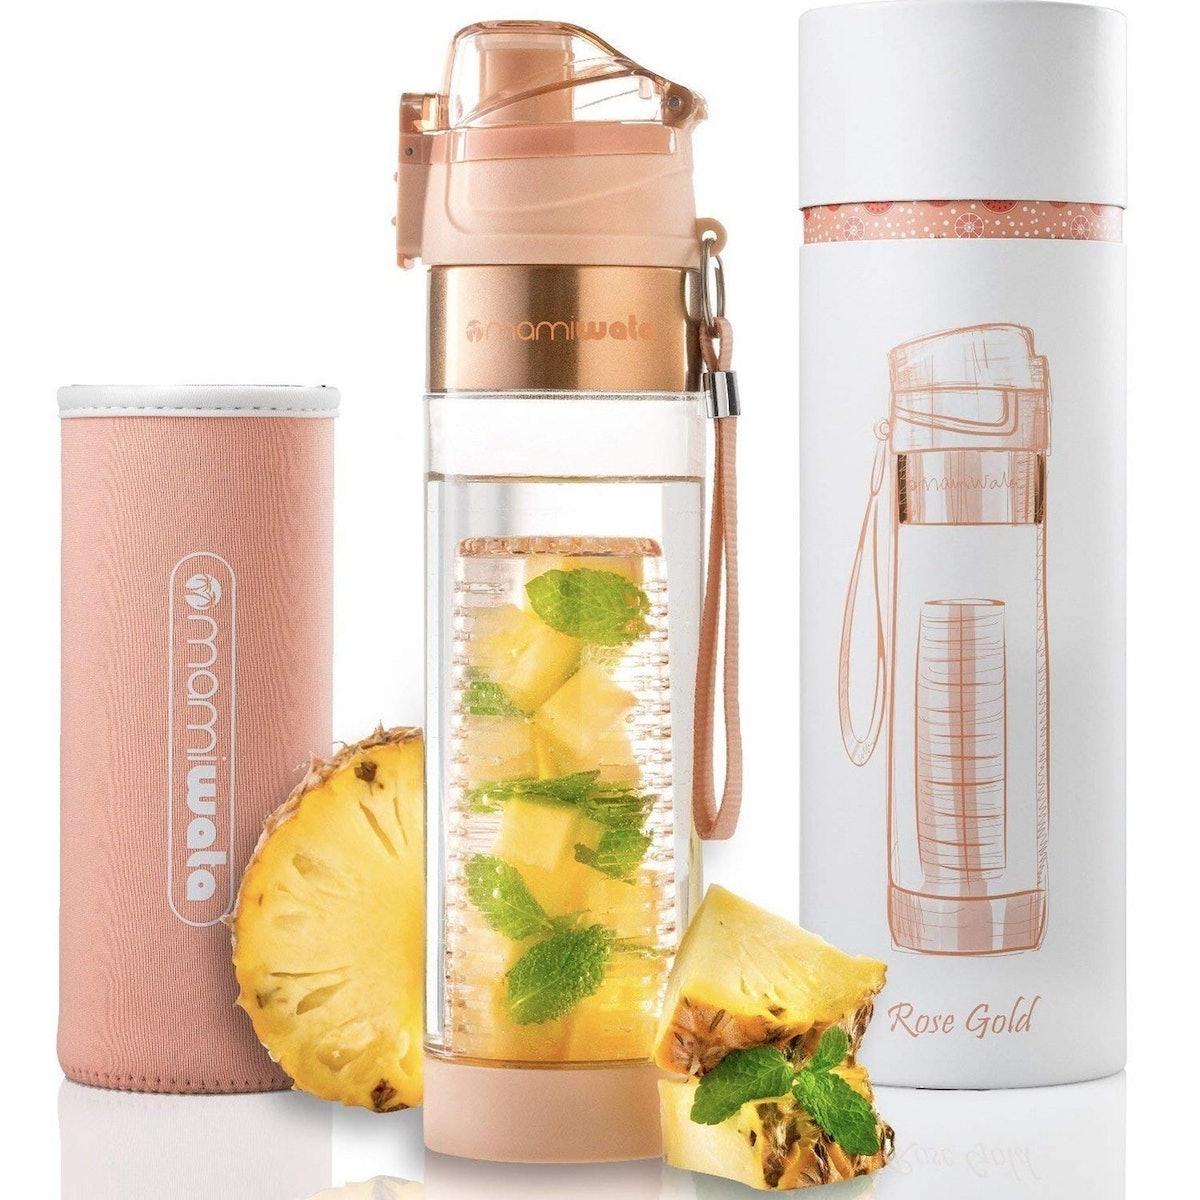 MAMI WATA Fruit Infuser Water Bottle